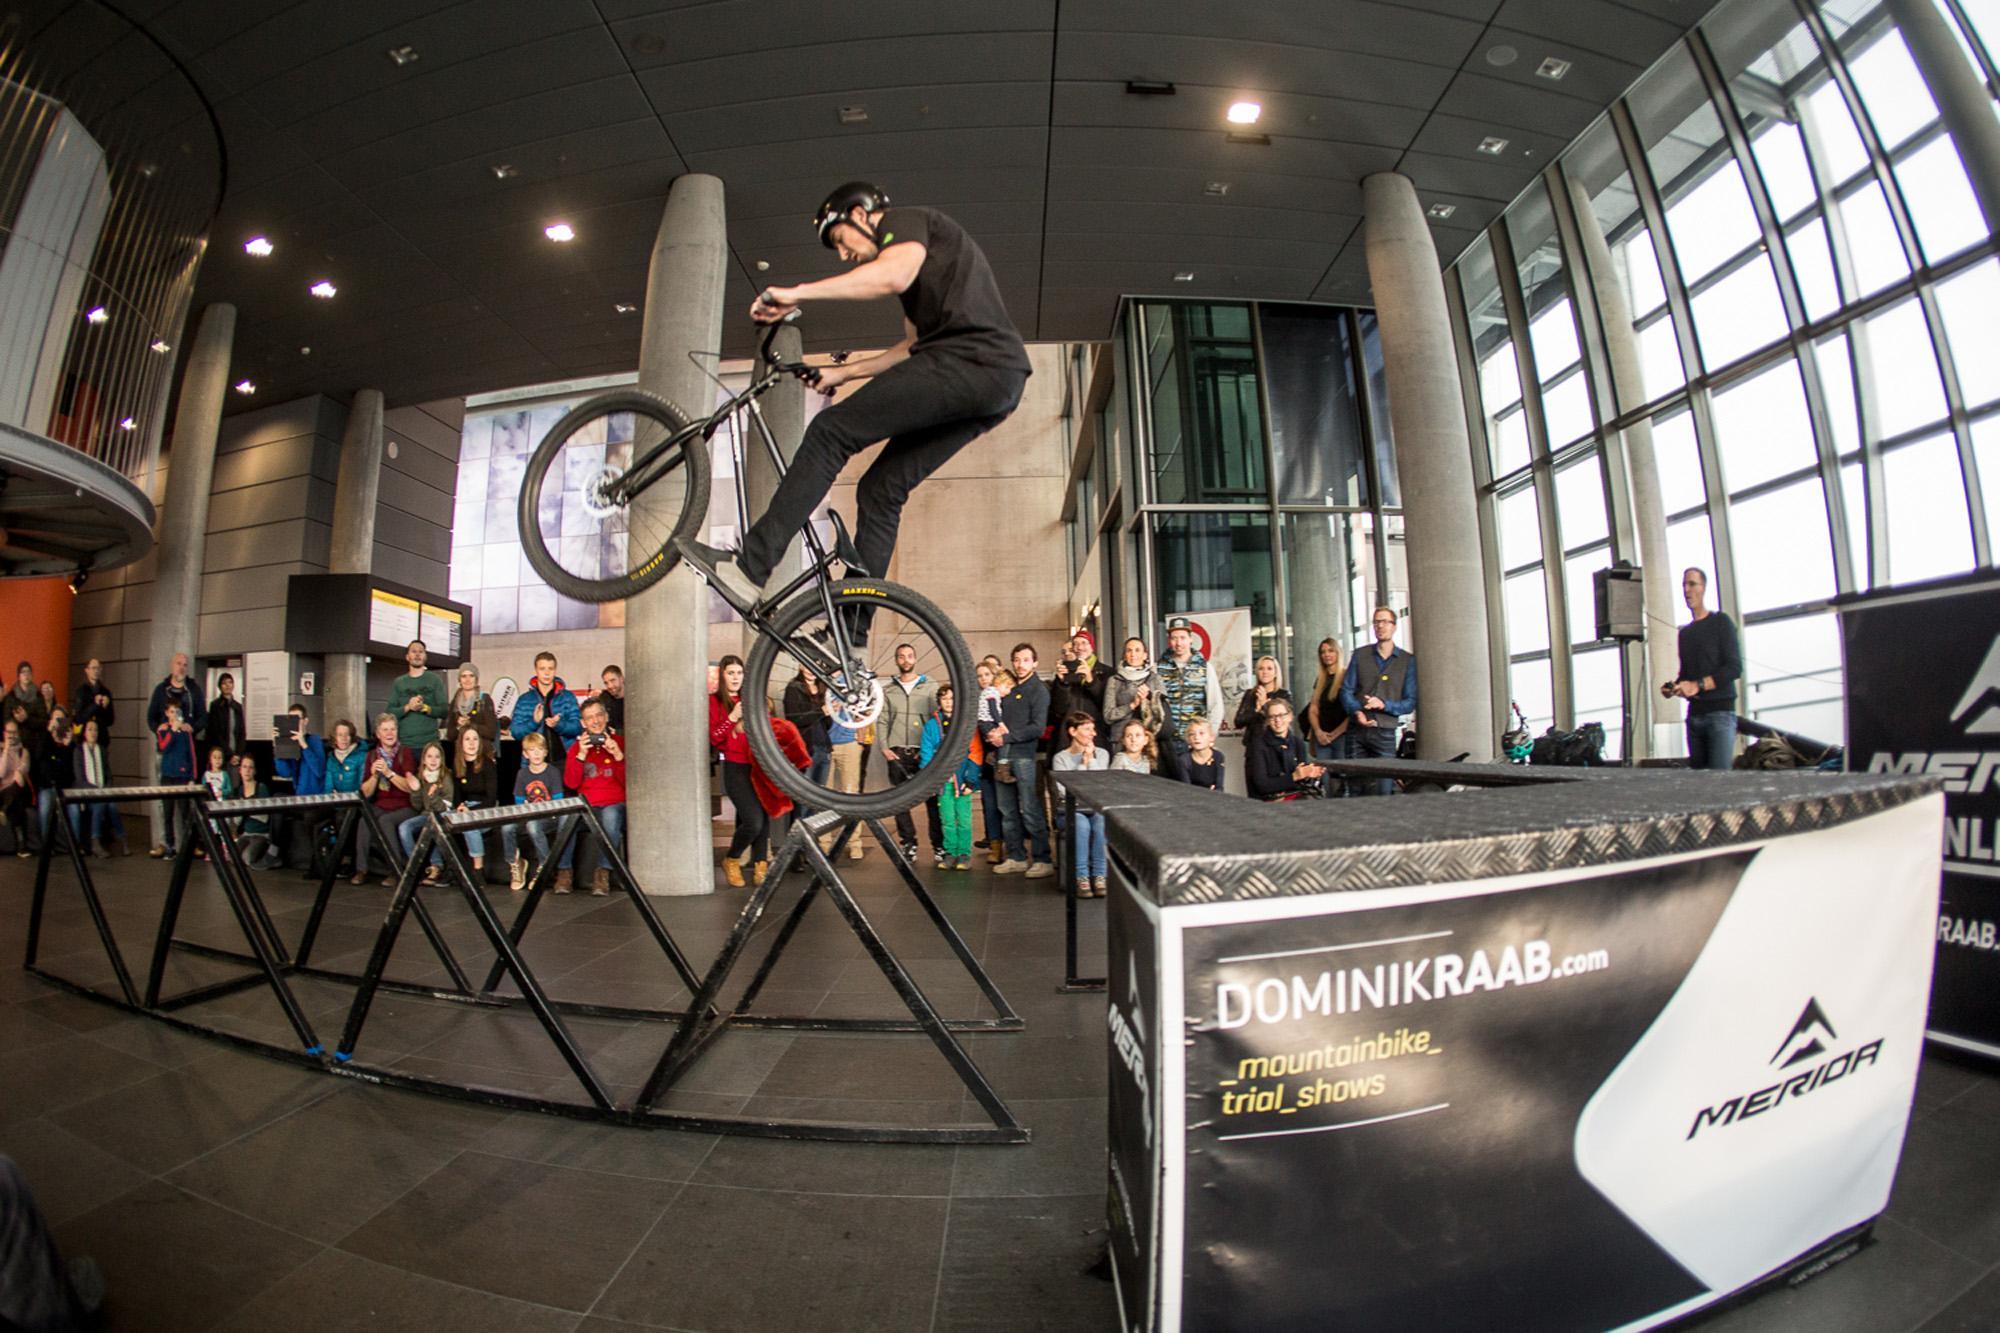 Dominik Raab fährt eine Show